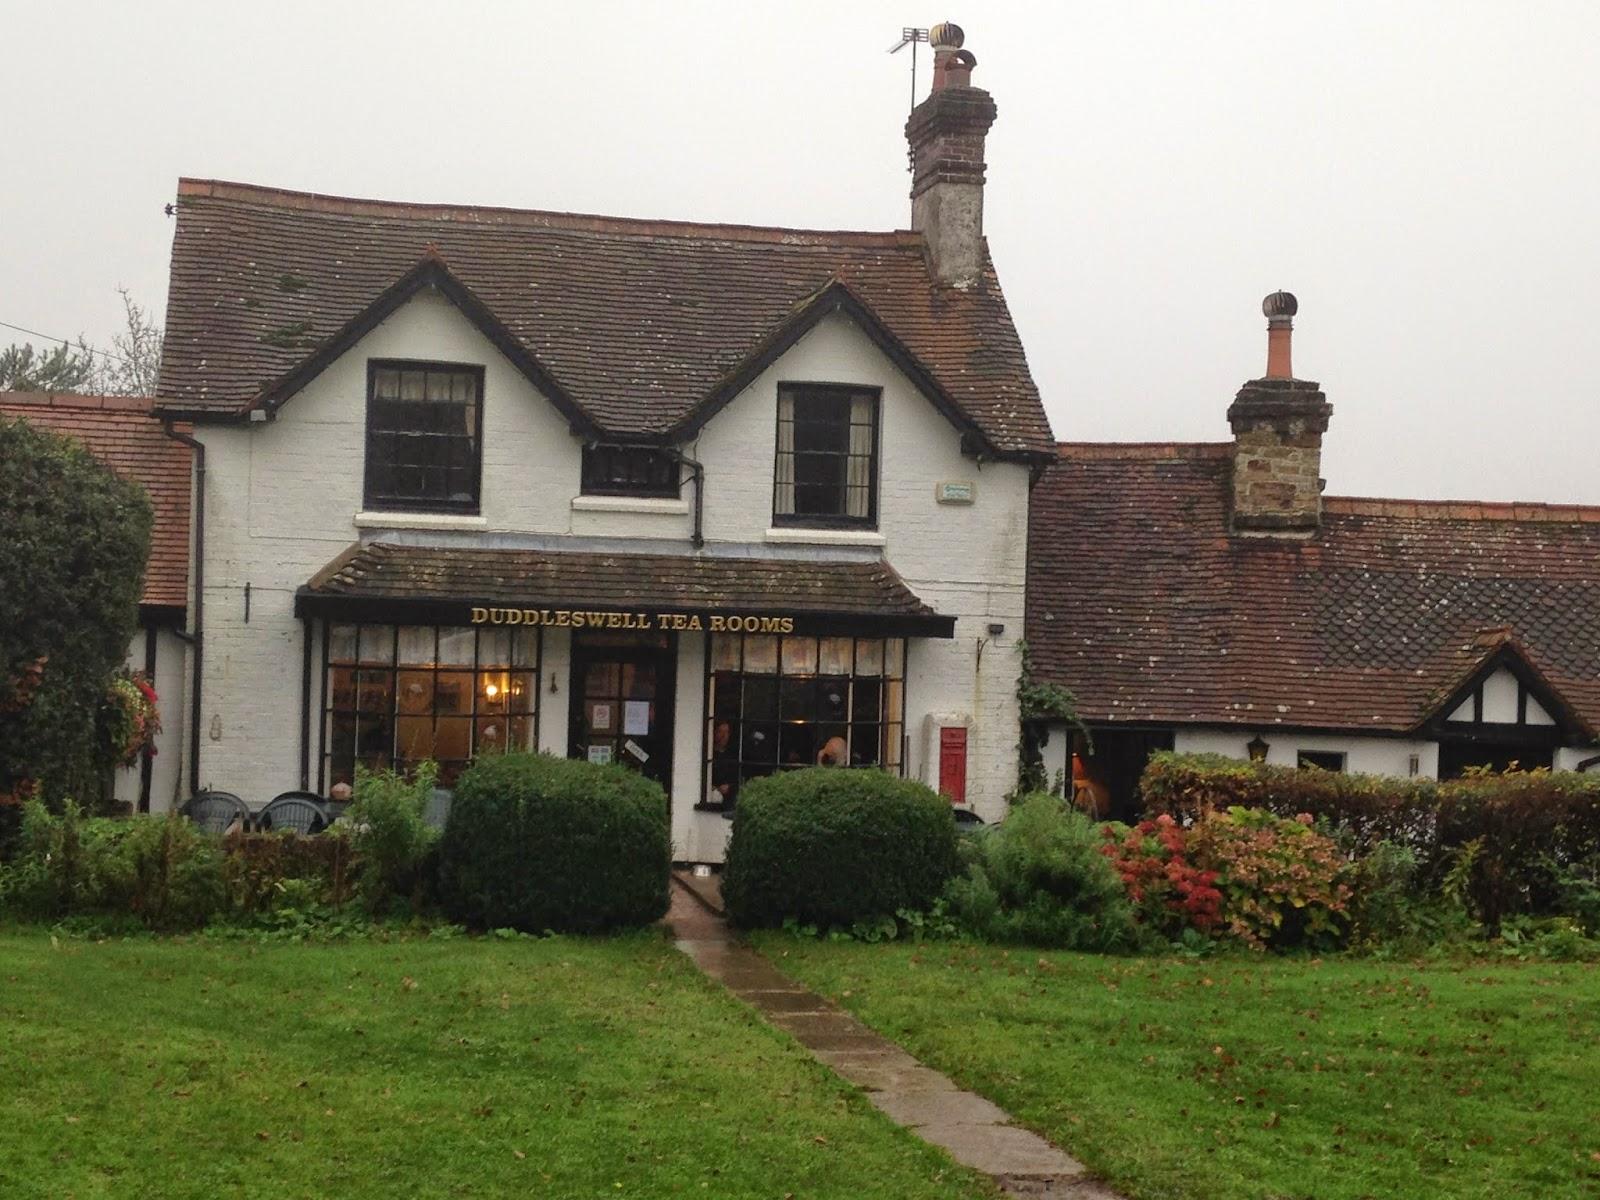 Duddleswell Tea Room Nearby